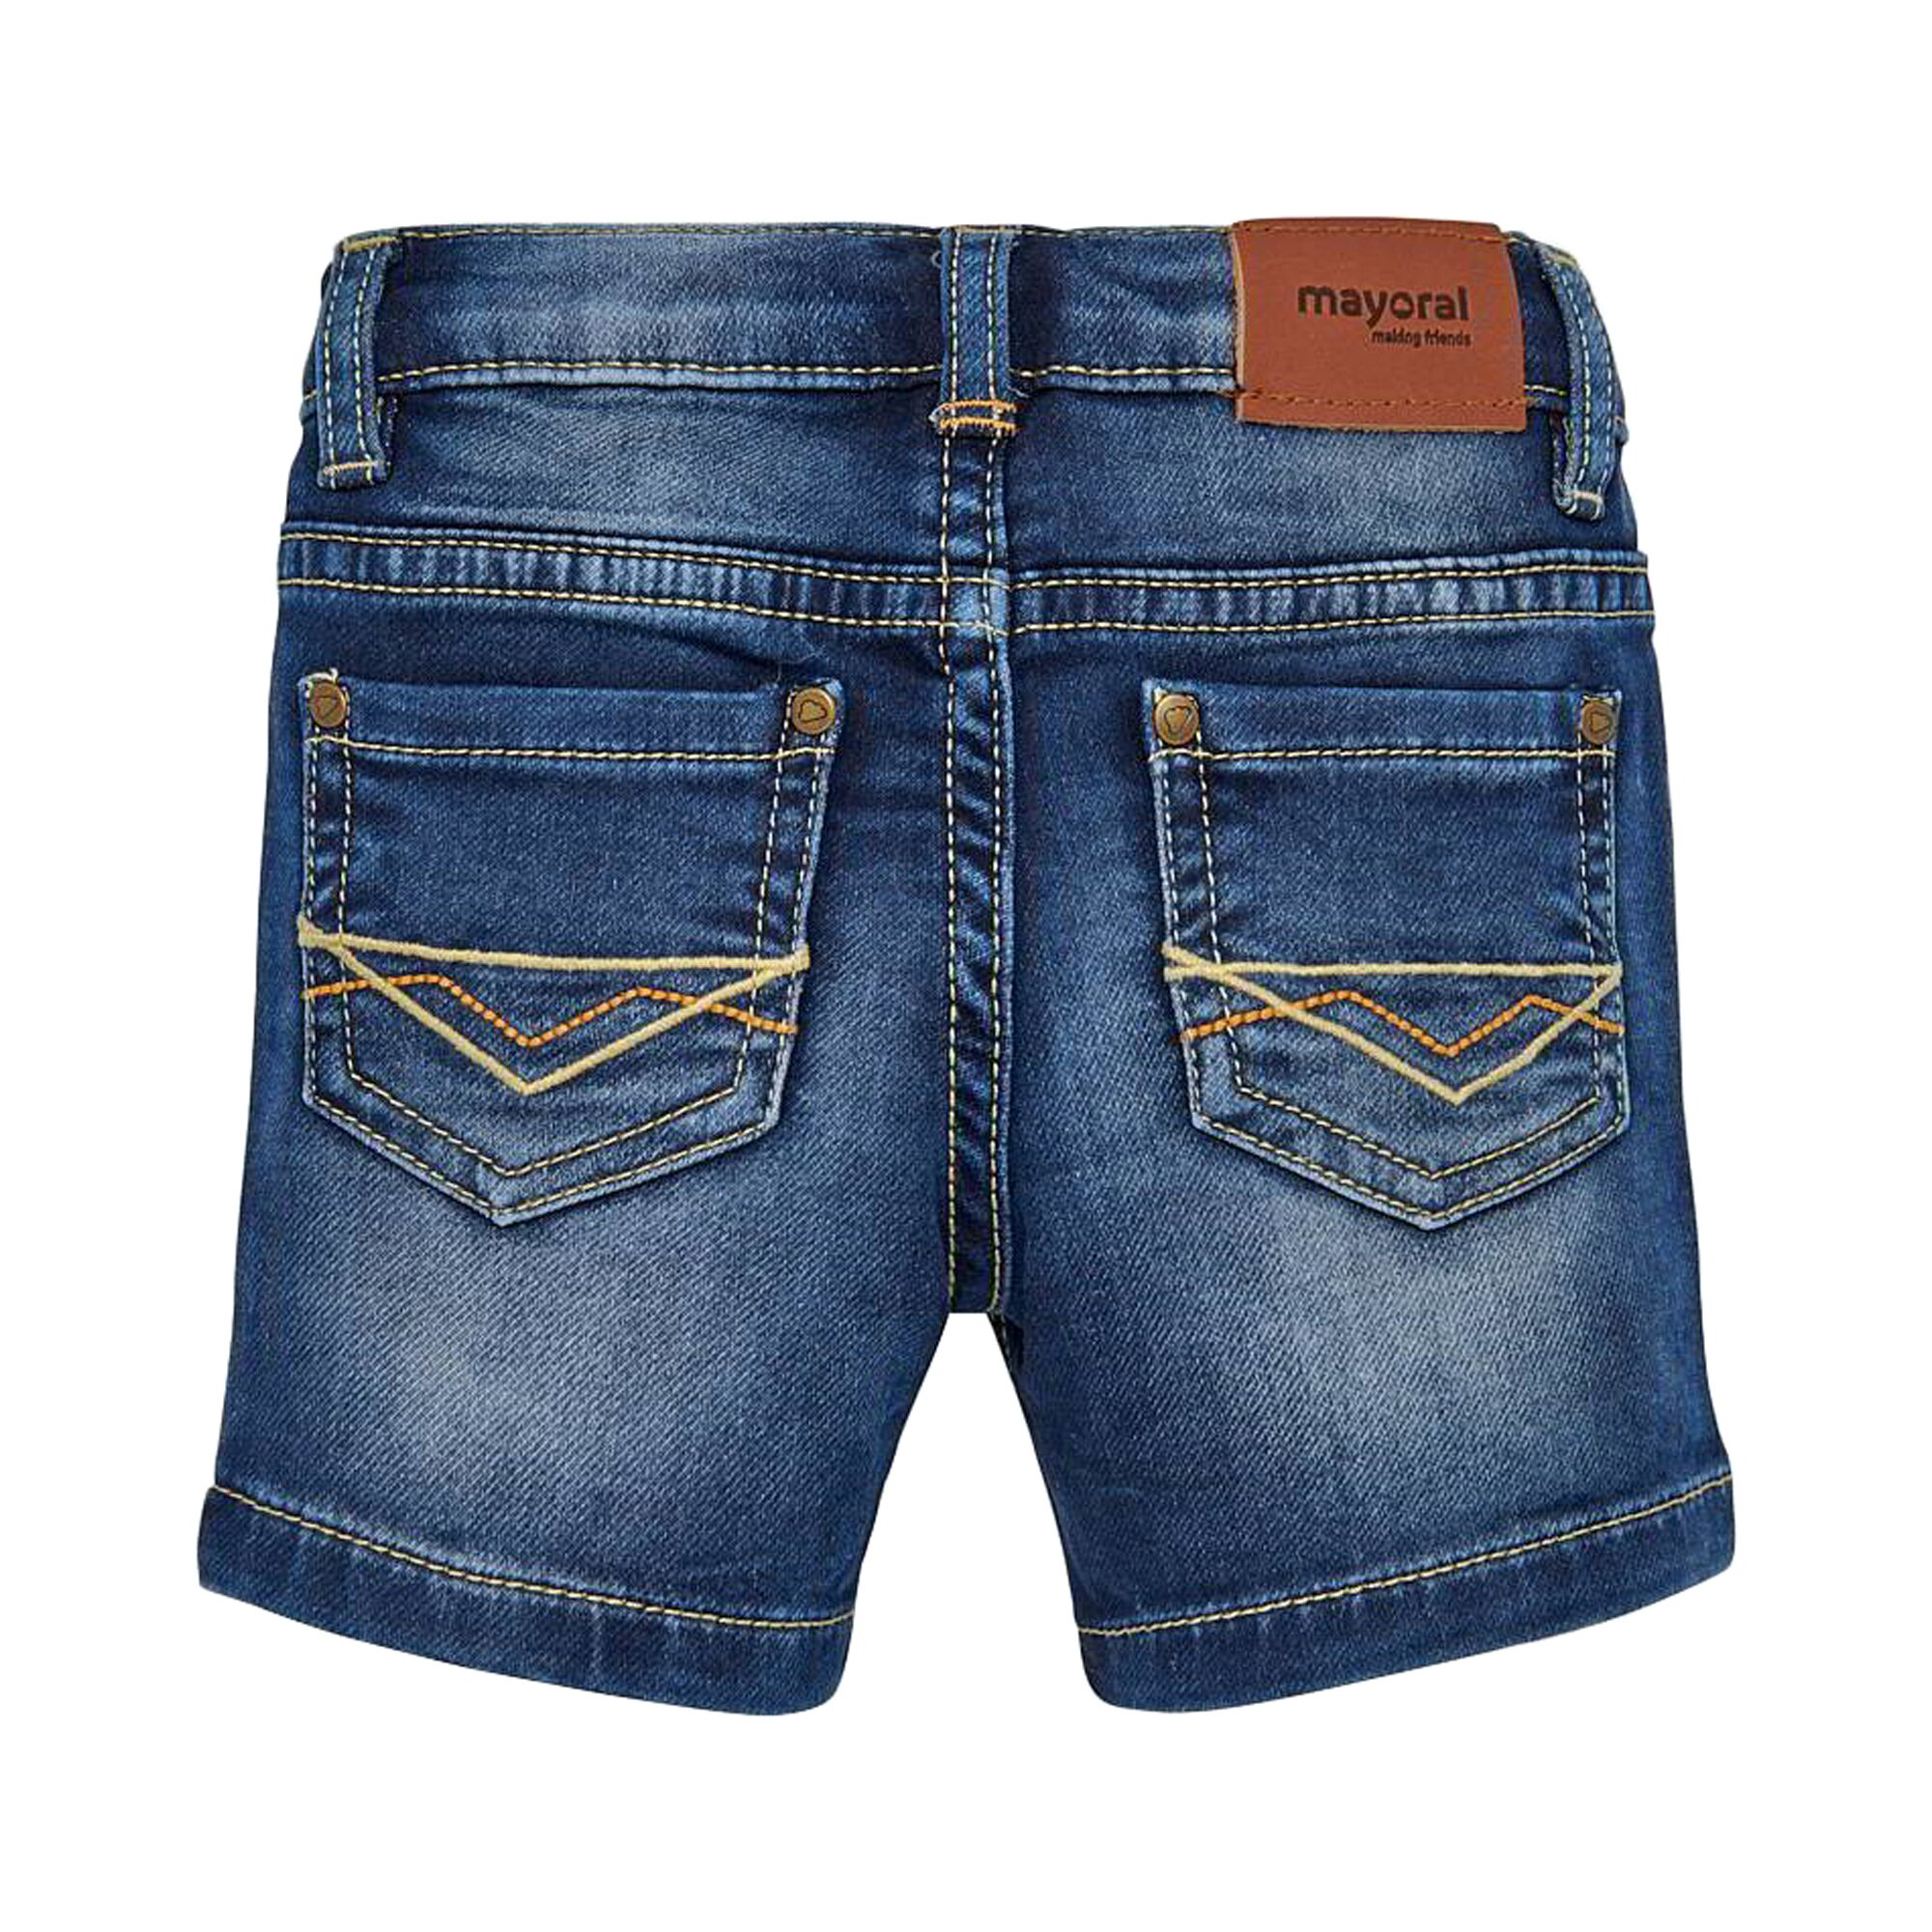 mayoral-jeans-bermuda-soft-denim